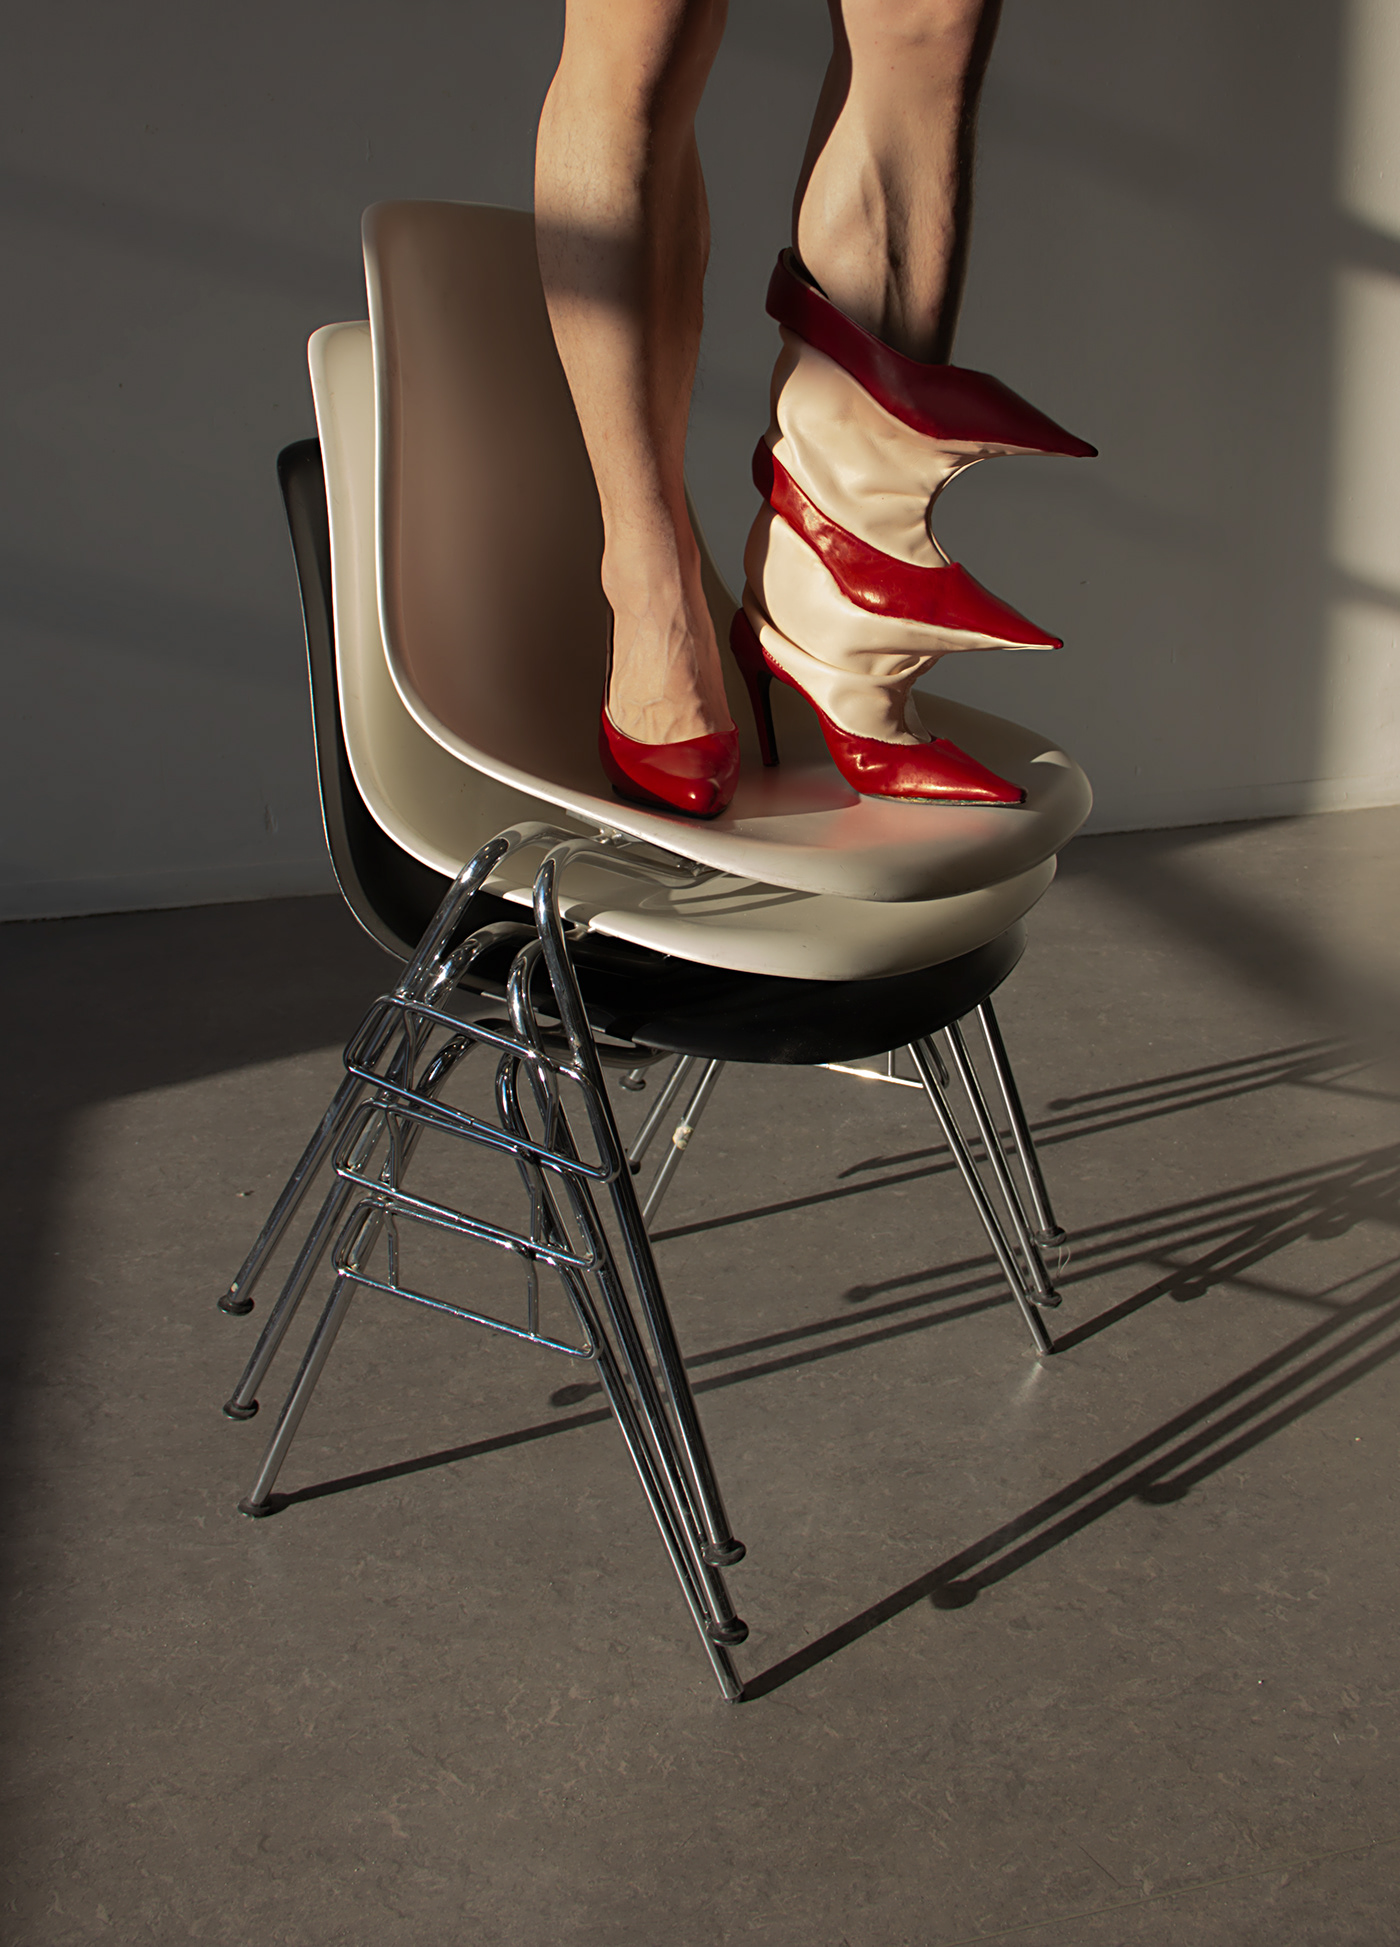 Image may contain: floor, indoor and footwear